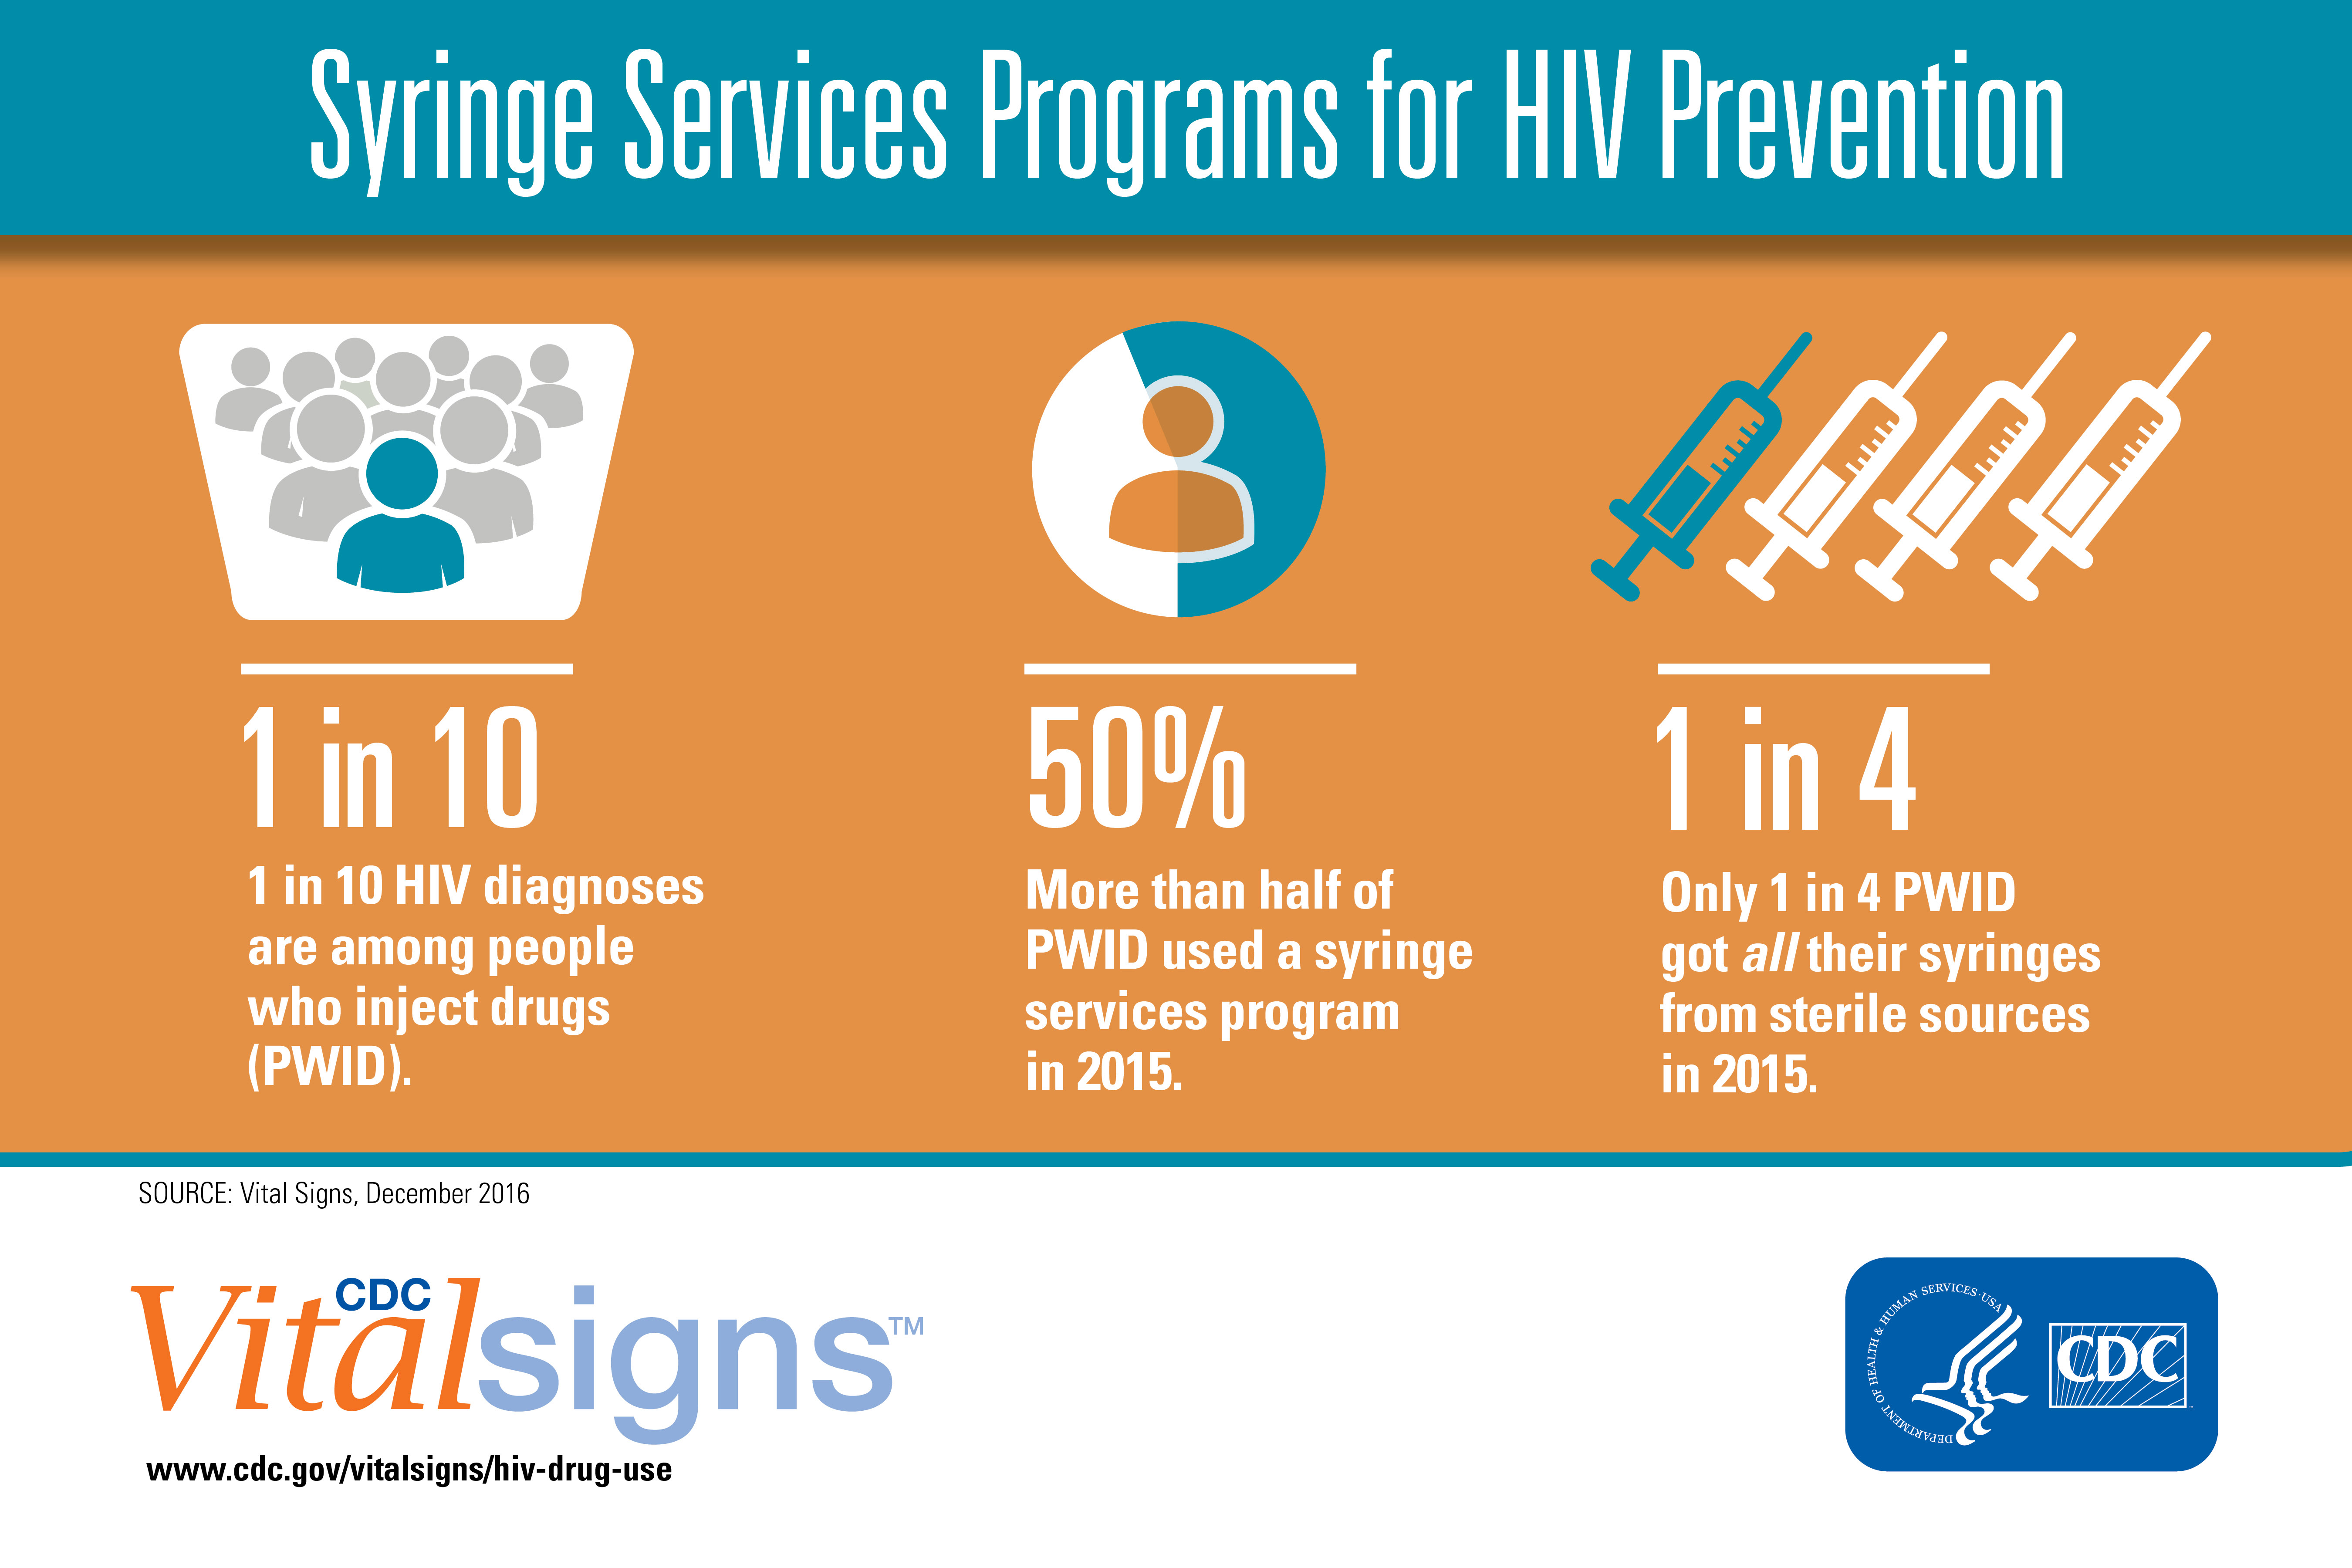 Syringe Services Programs